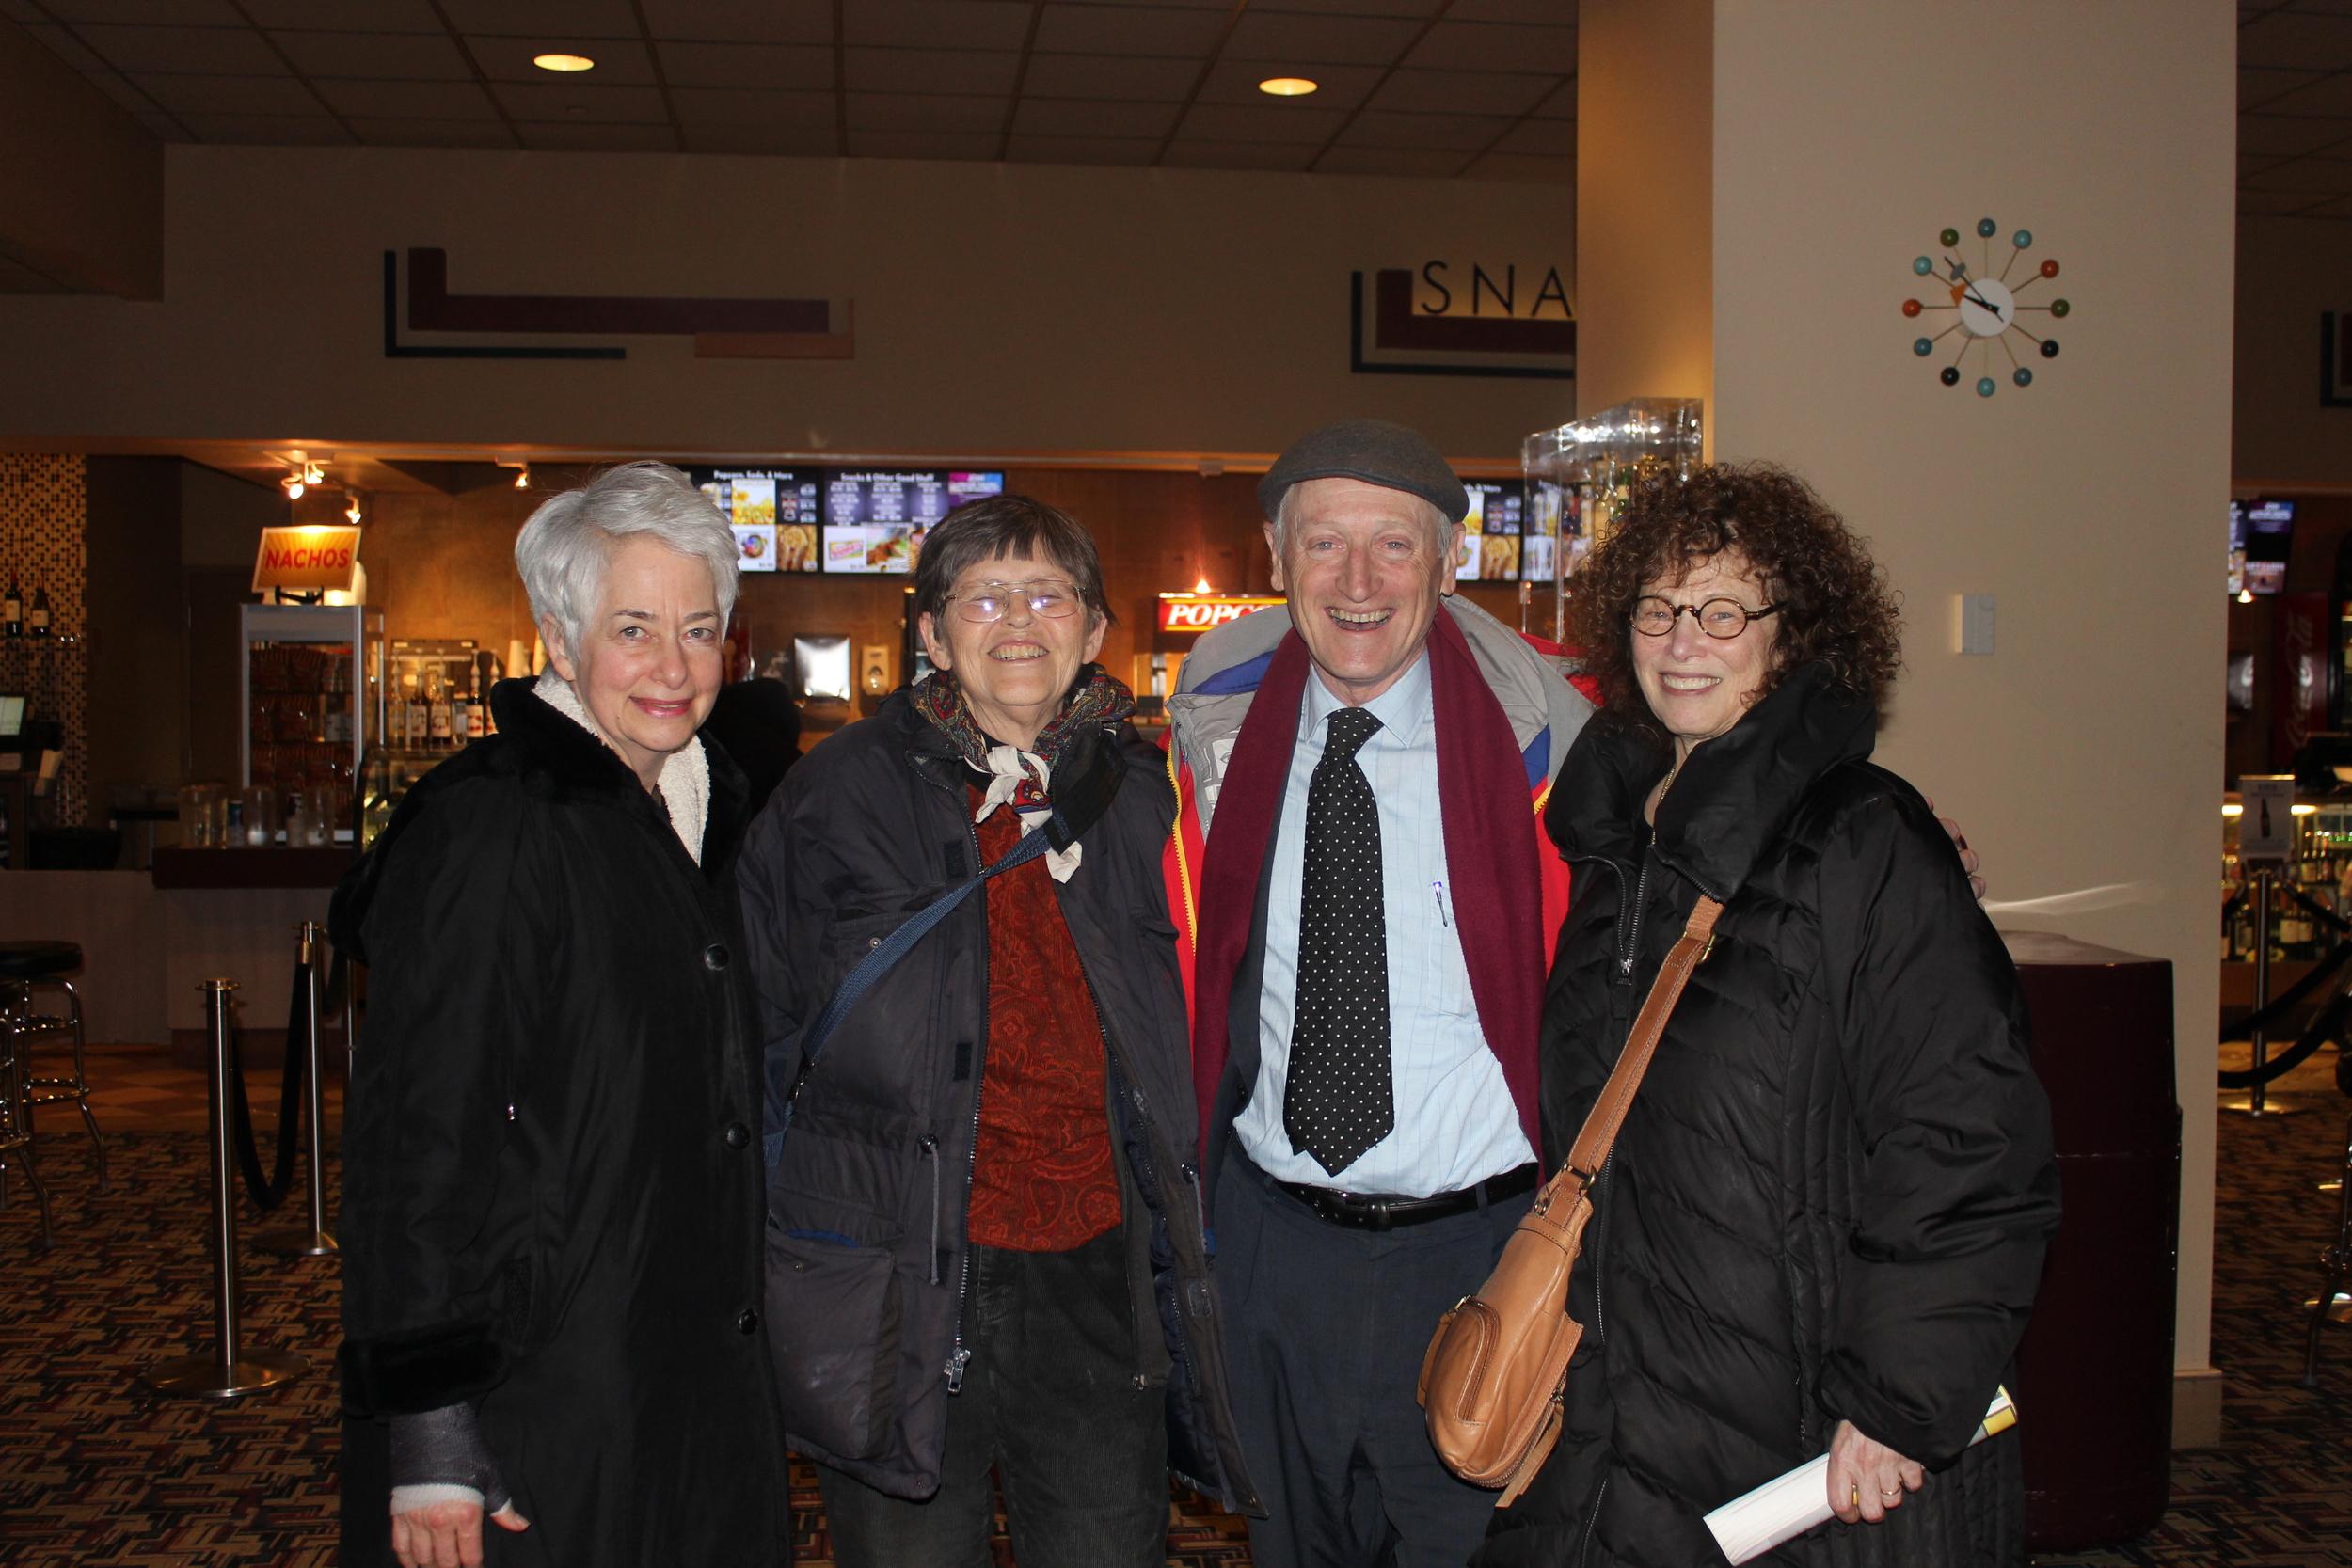 Heather Booth, Jo Freeman, Paul Booth, Marilyn Webb